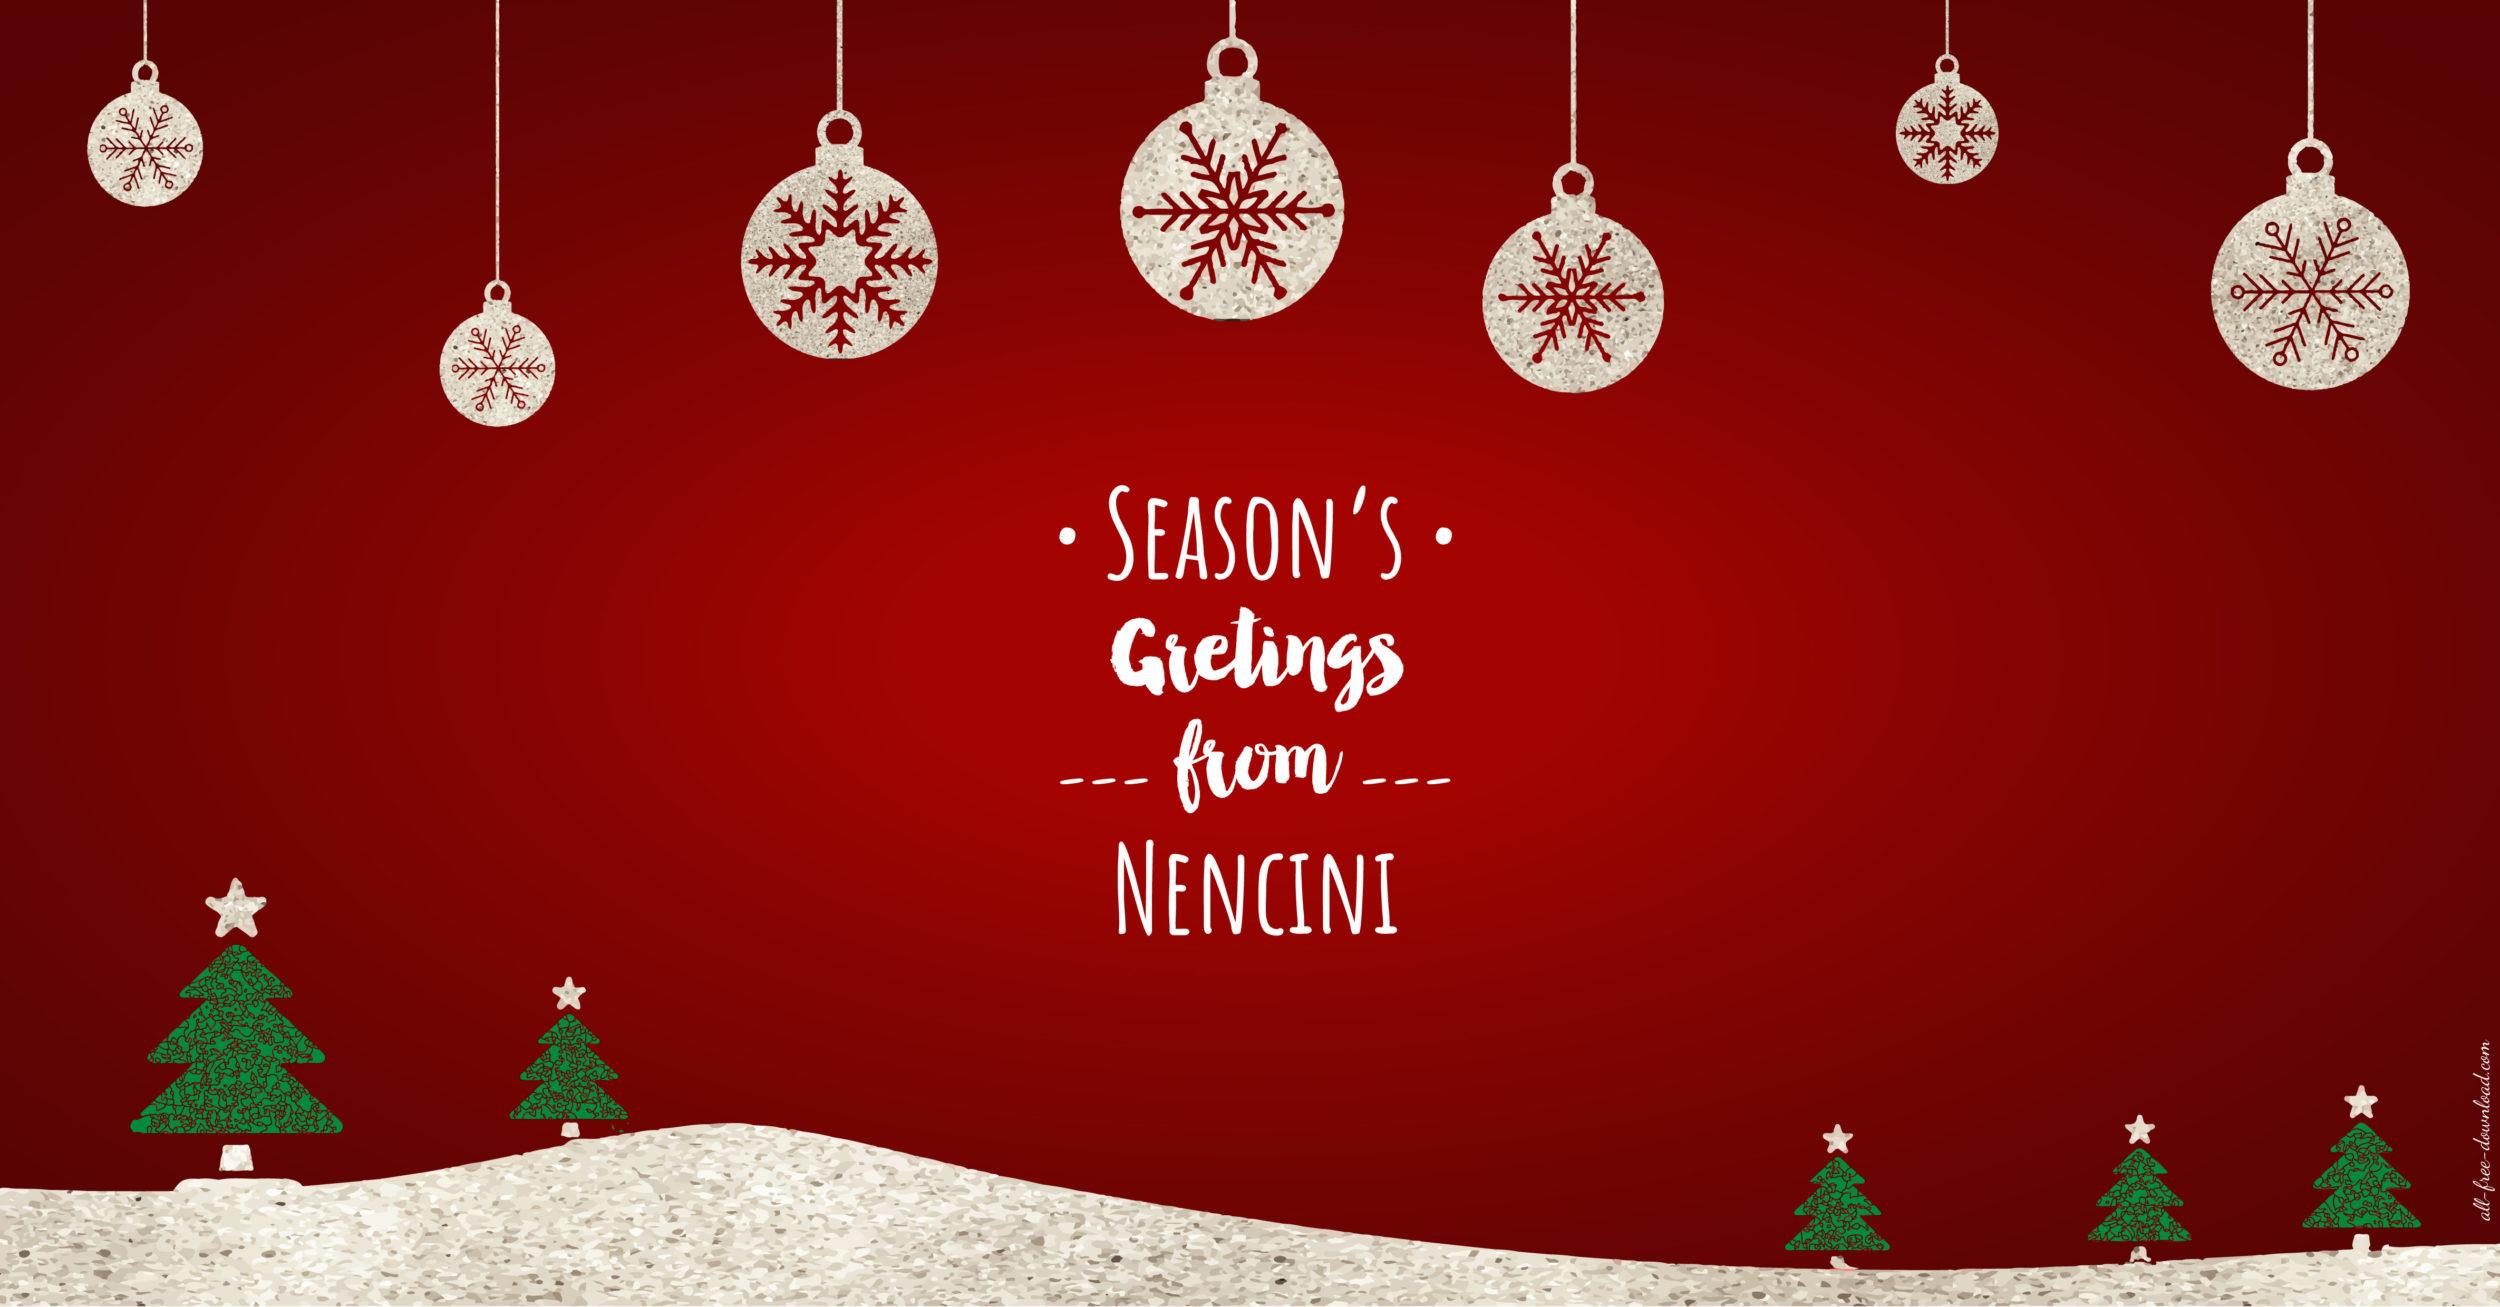 Seasons greetings from nencini nencini srl seasons greetings from nencini m4hsunfo